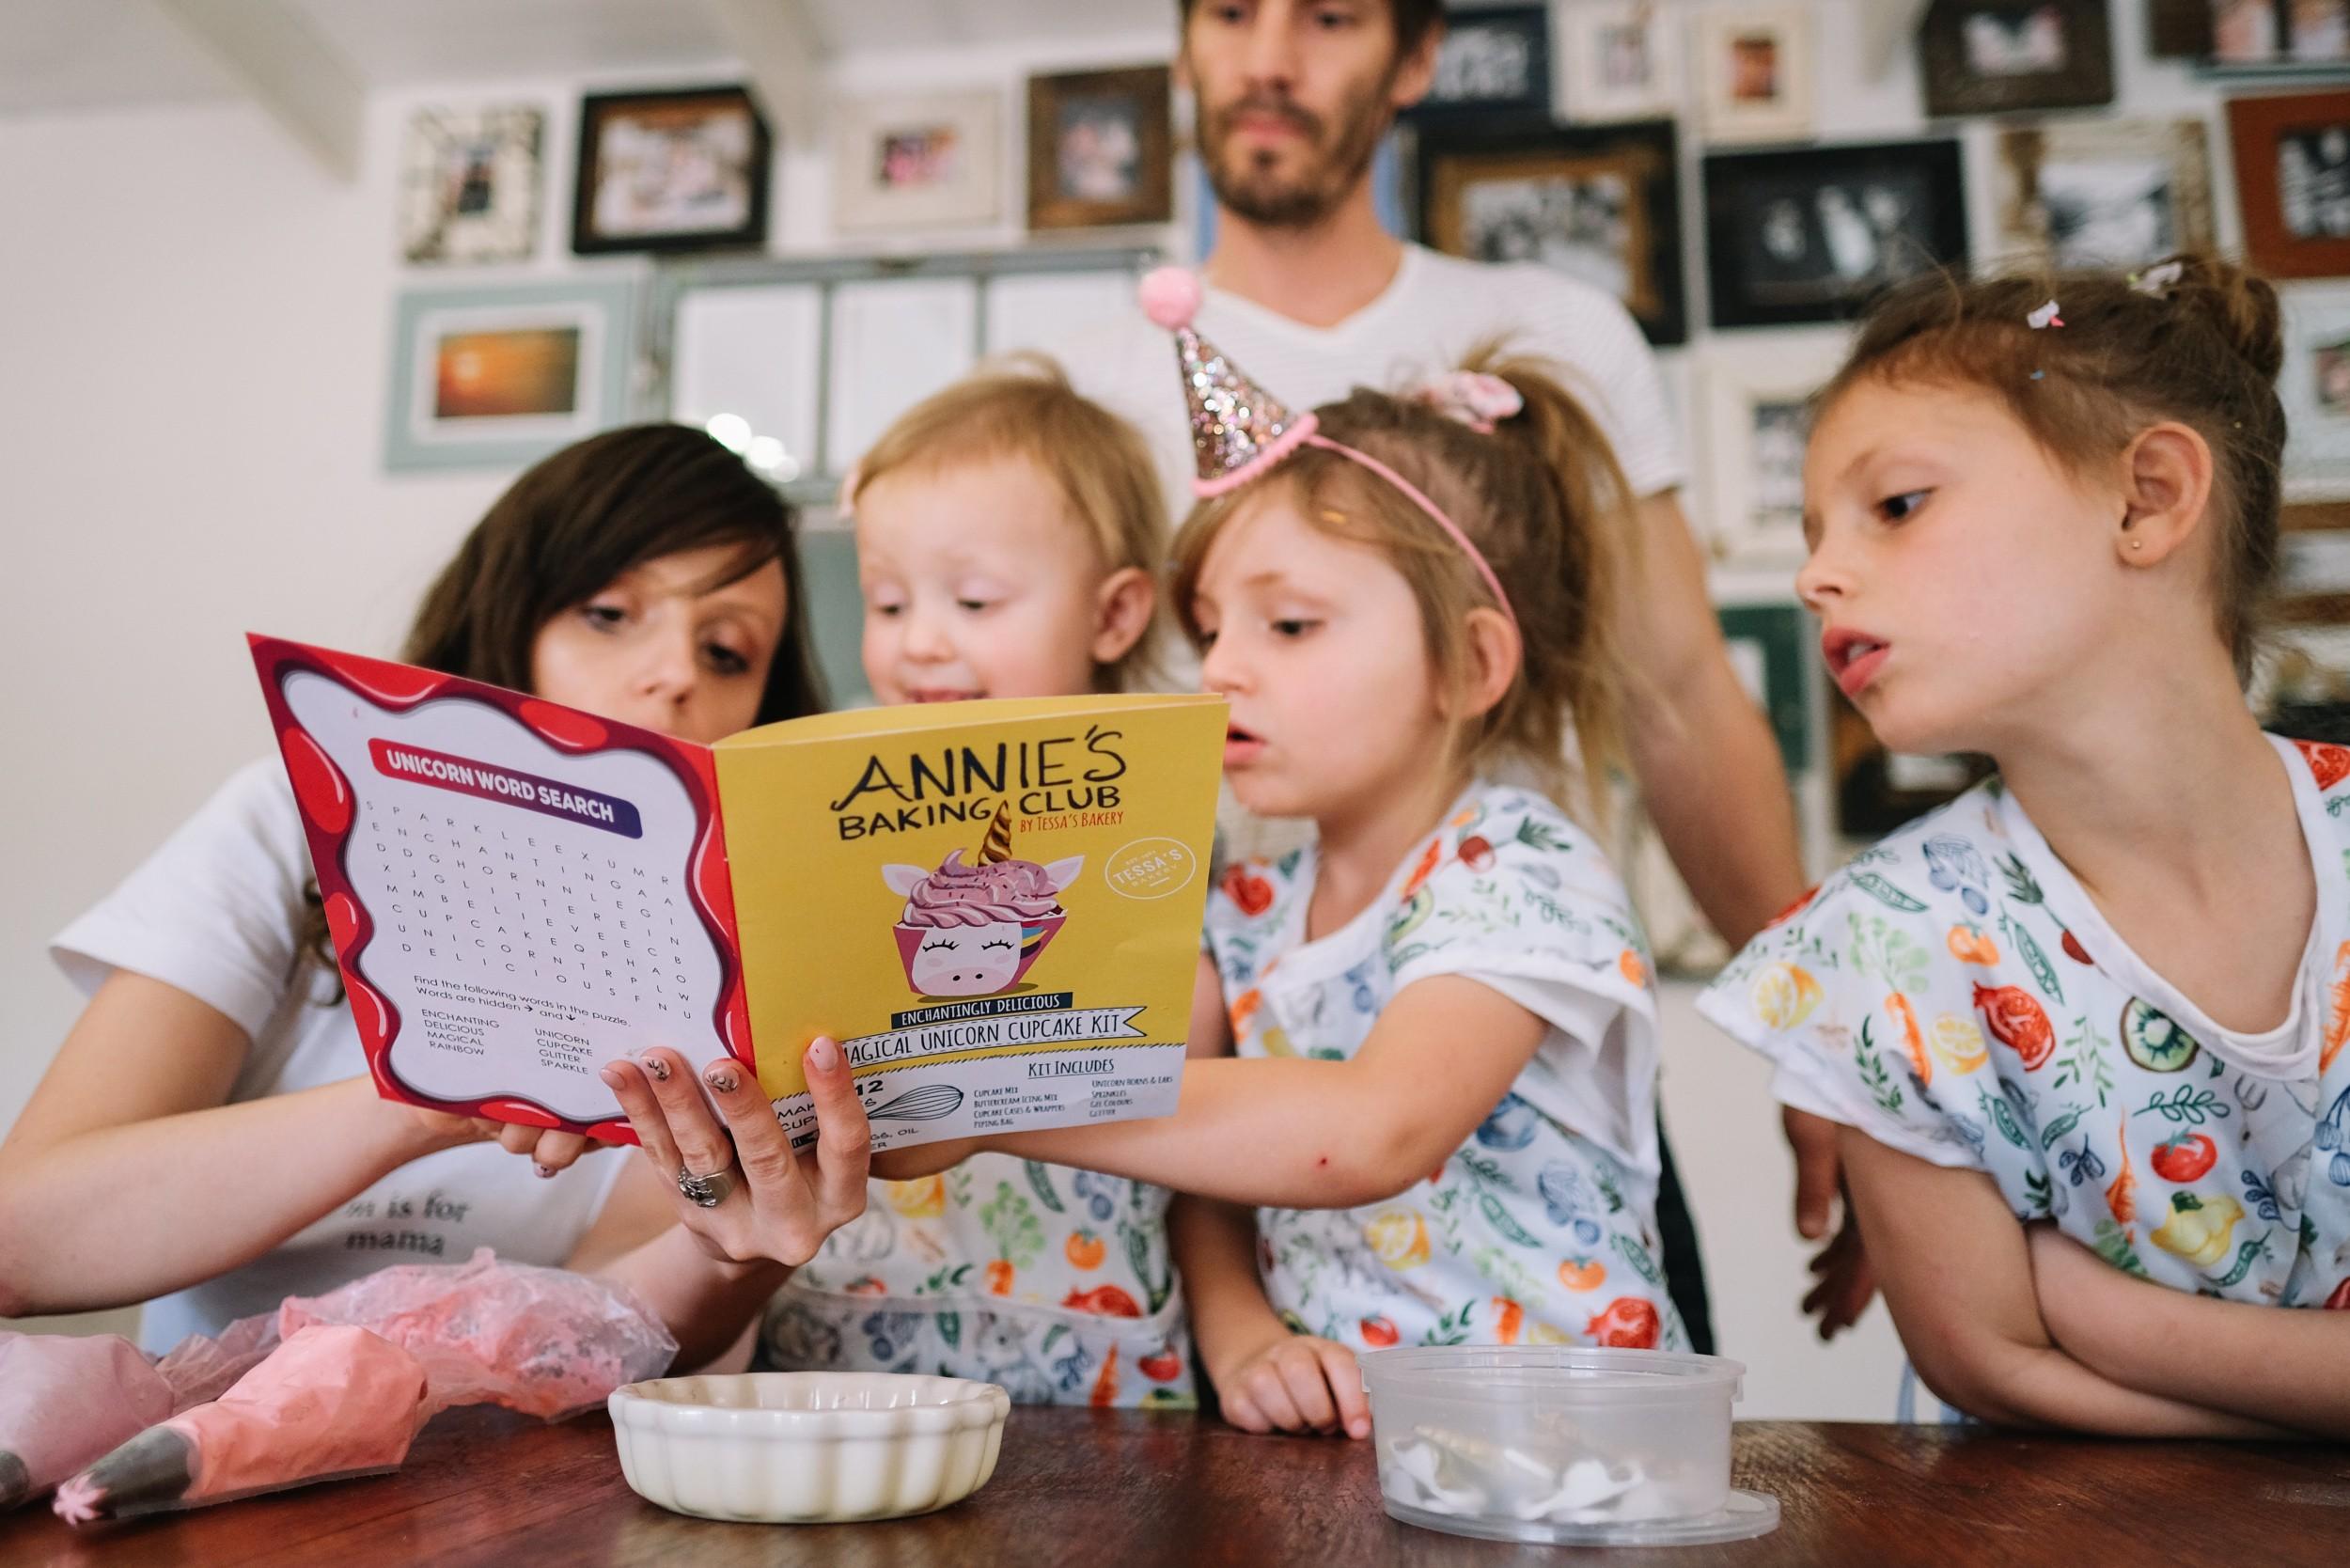 Justamamma Annies Baking Club Home Baking Kits0393